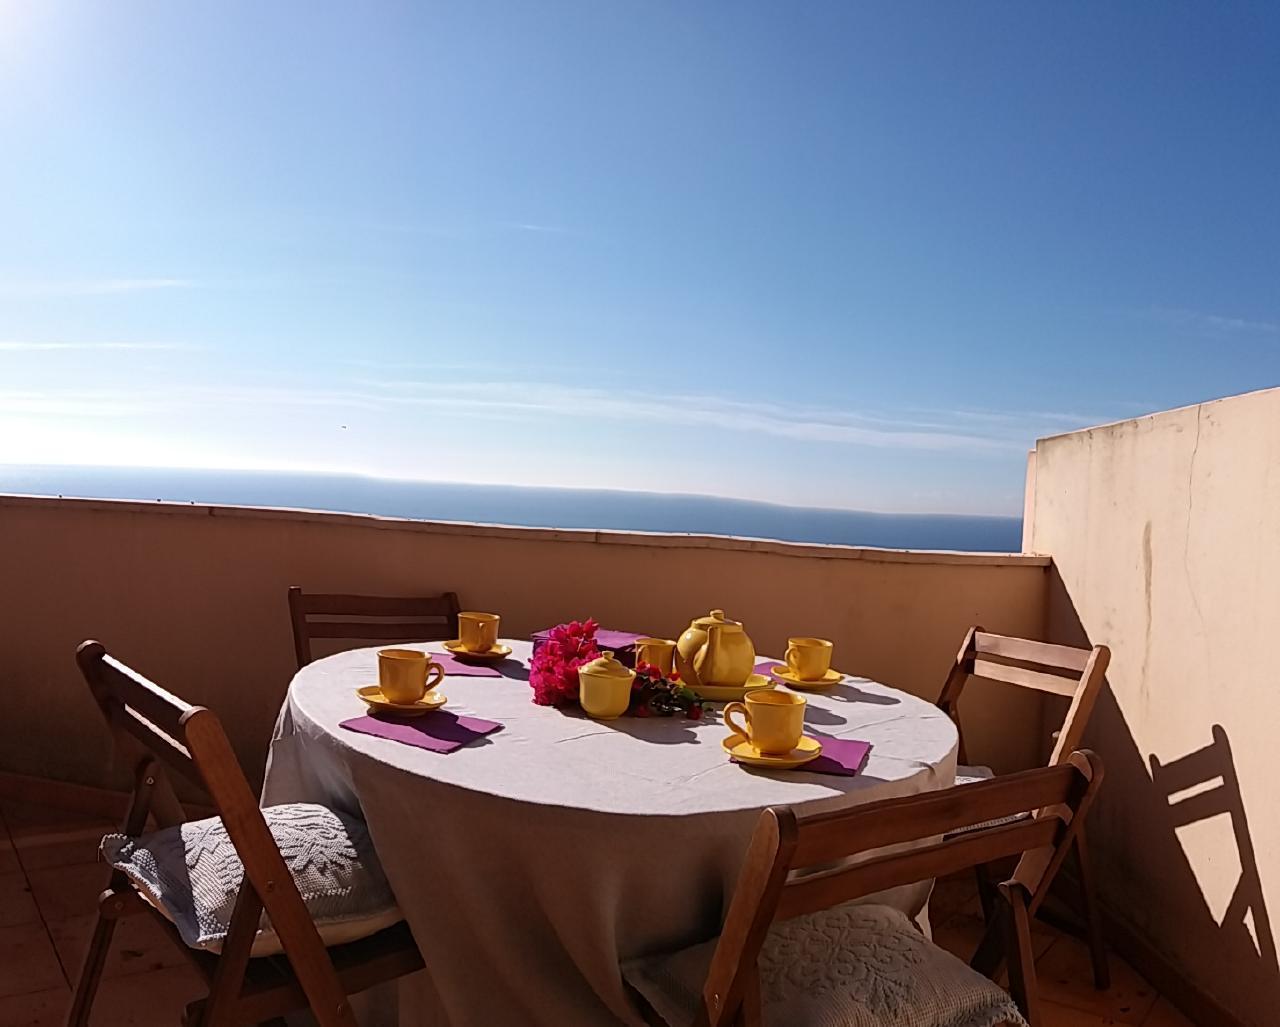 Ferienhaus in Funtana Meiga, 100 Meter vom Meer entfernt (498100), Oristano, Oristano, Sardinien, Italien, Bild 17